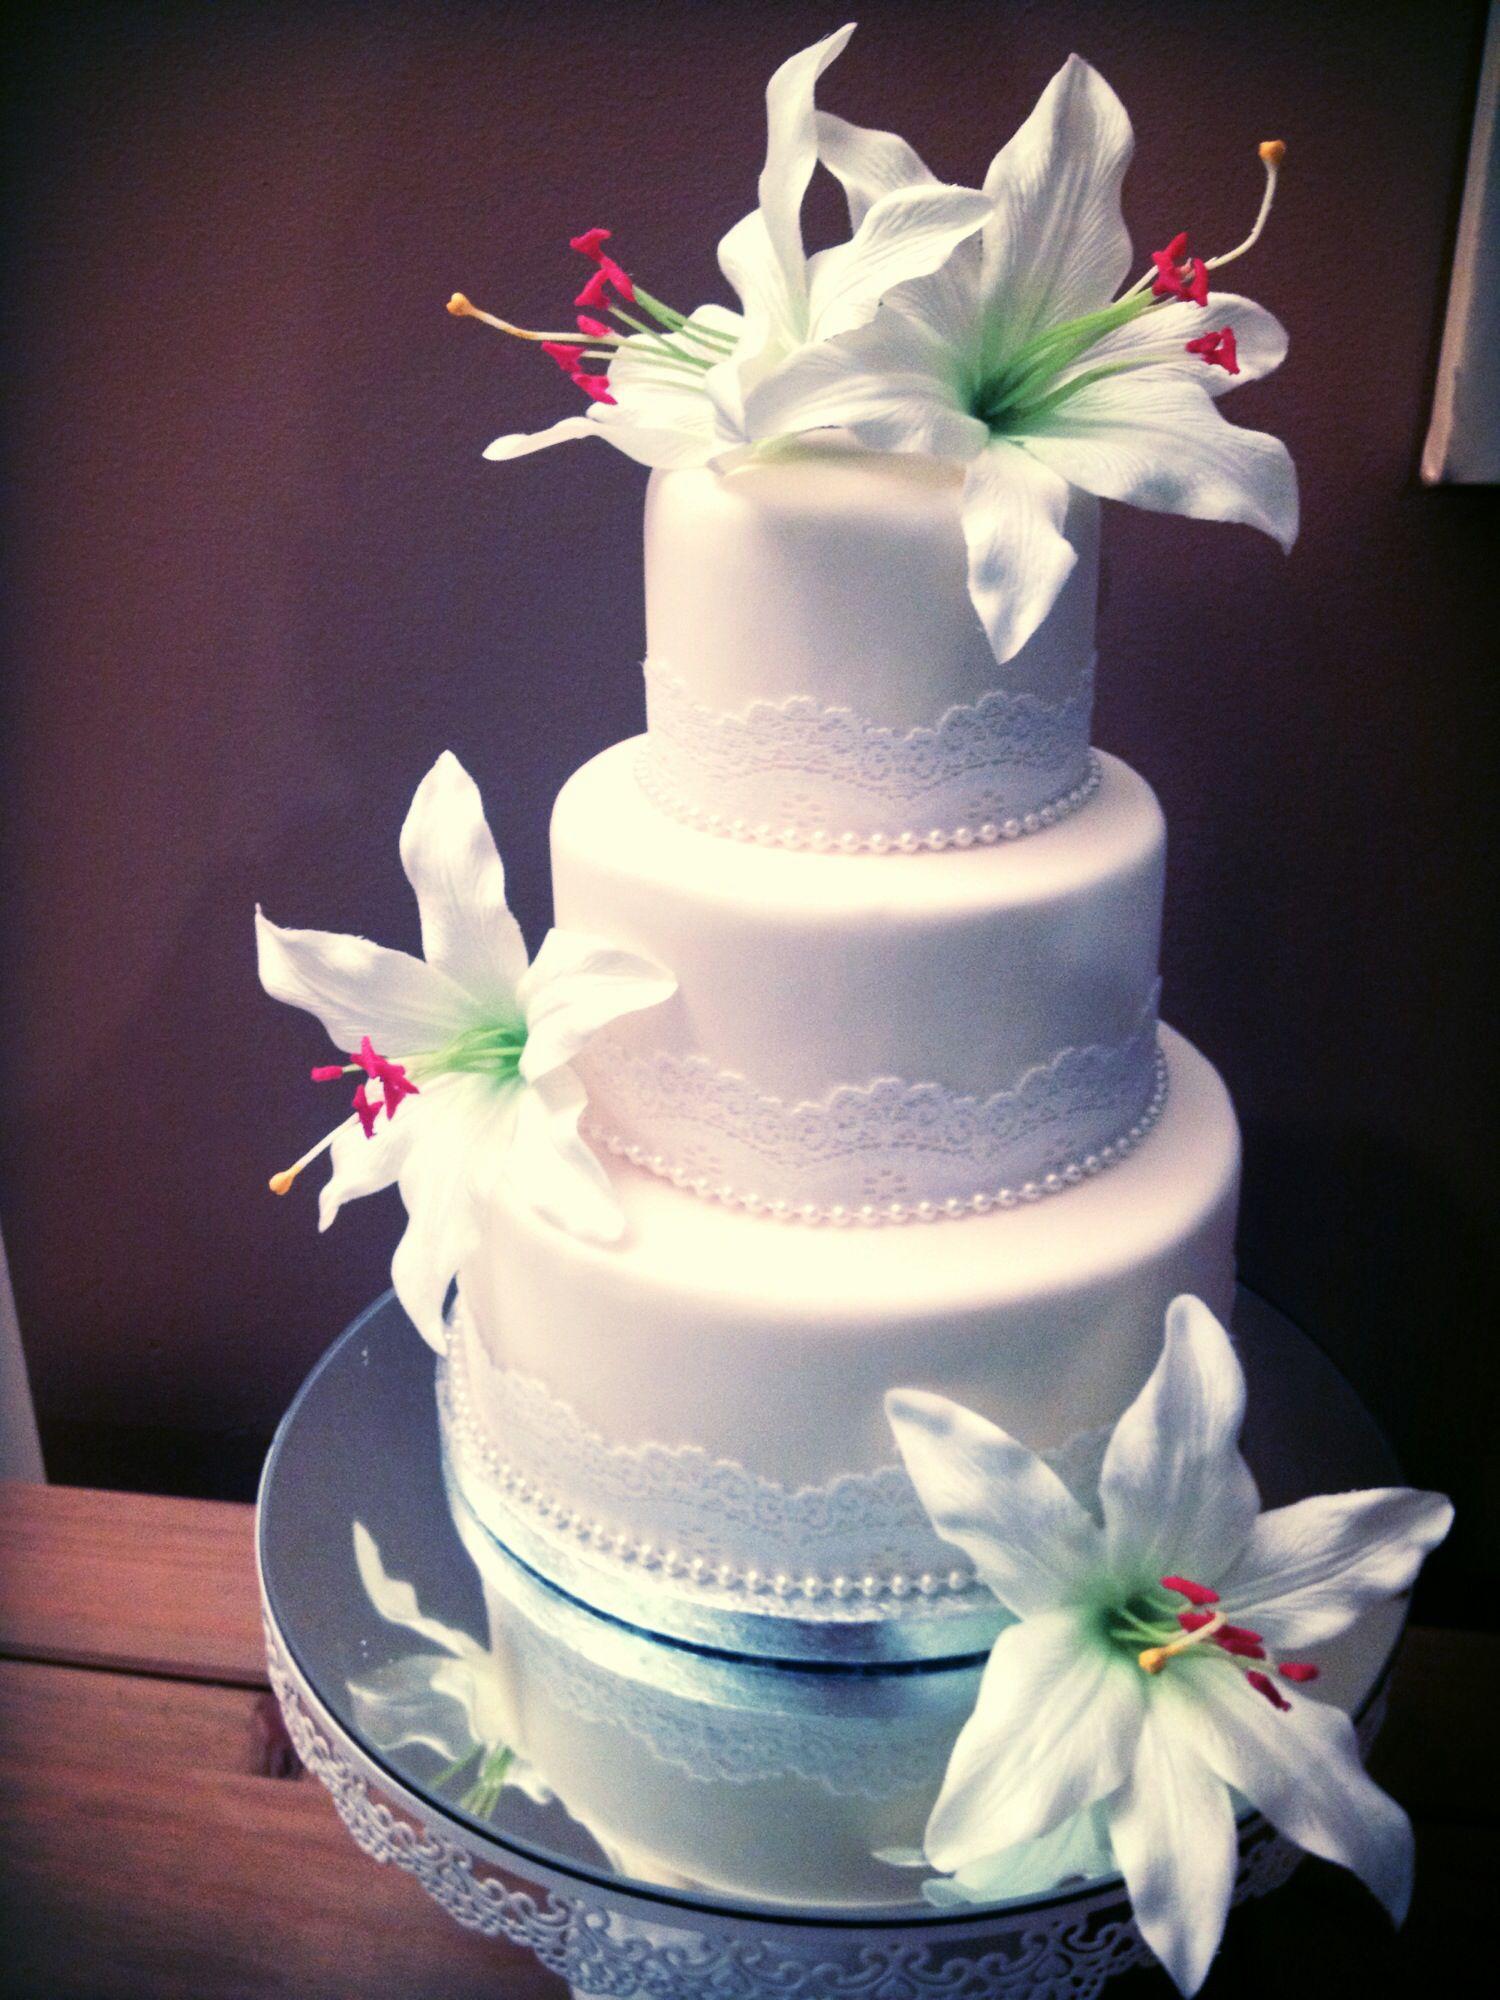 8-layered Wedding Cake With Edible Pearls #2050084 - Weddbook